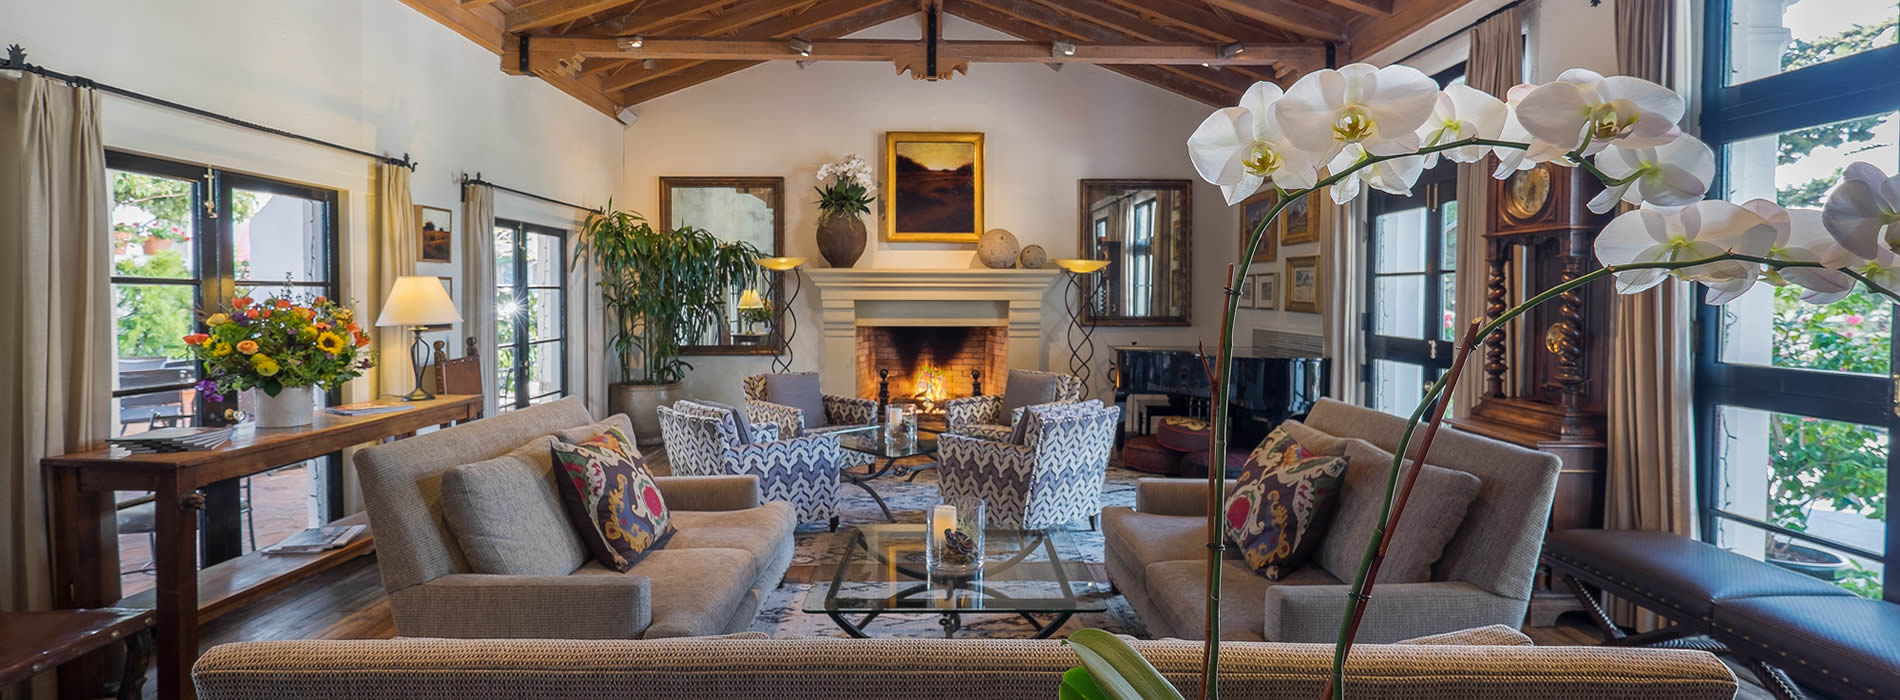 carmel boutique inns cypress inn doris day hotel. Black Bedroom Furniture Sets. Home Design Ideas